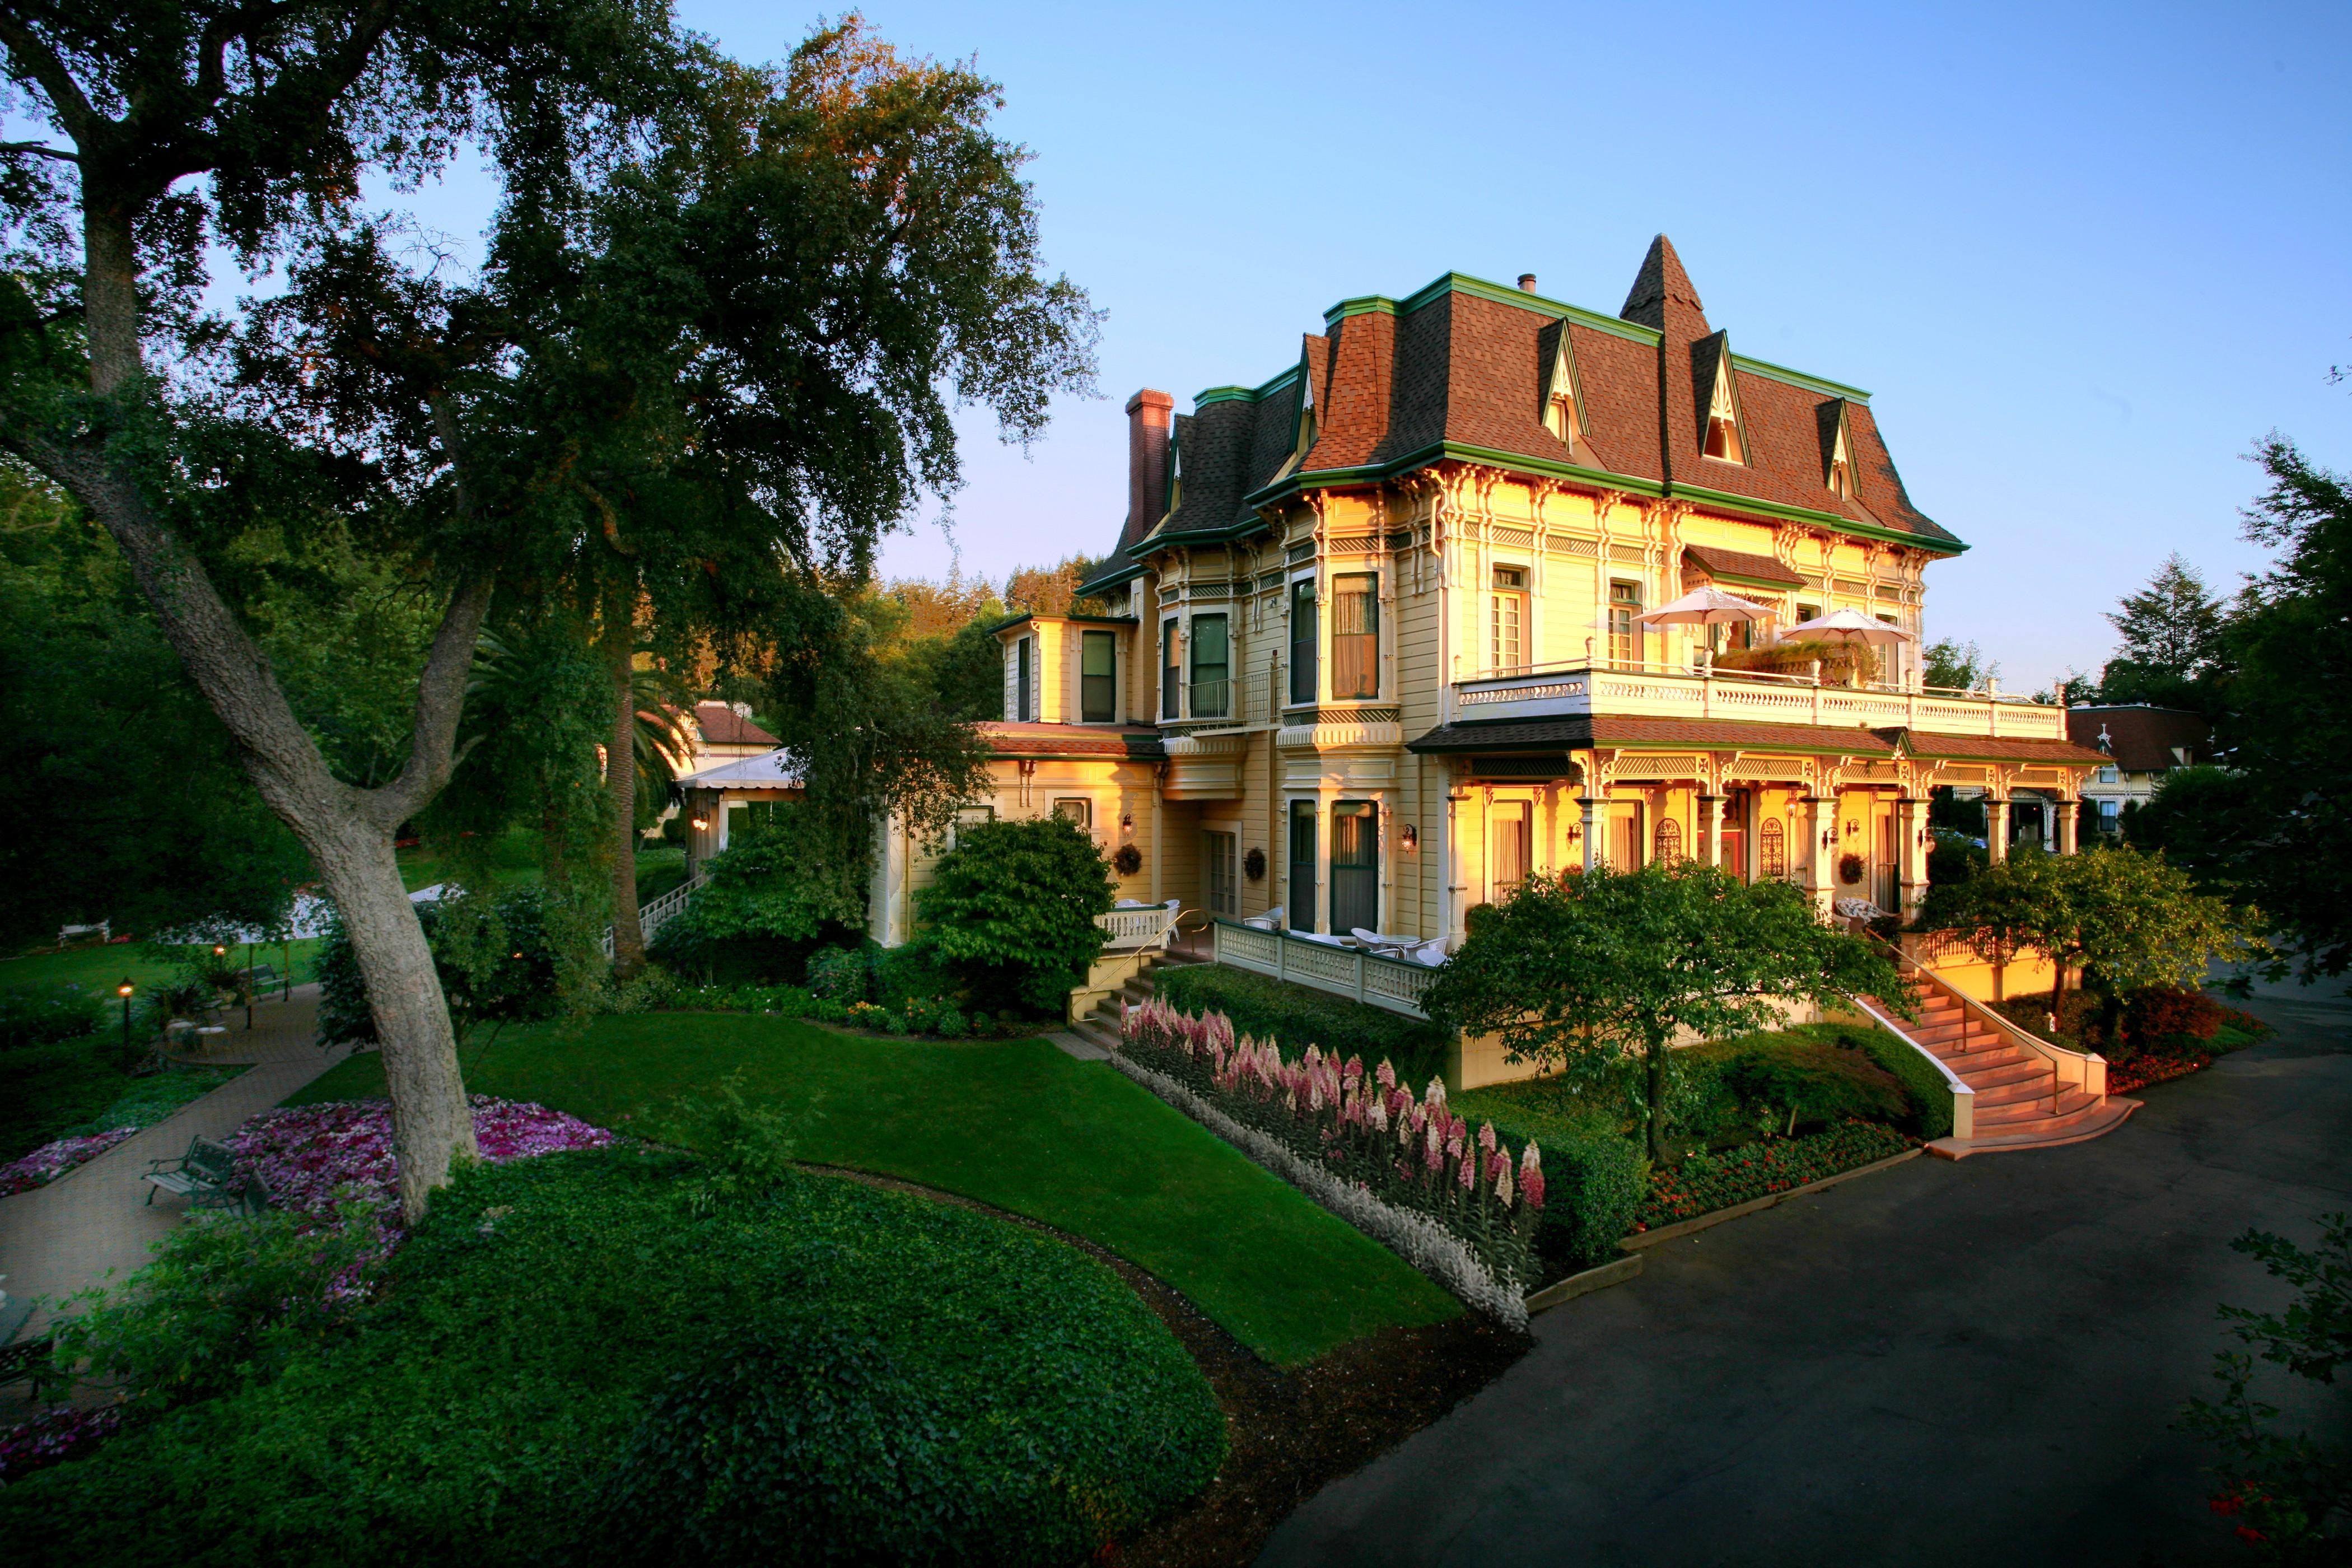 Madrona Manor in Healdsburg, California